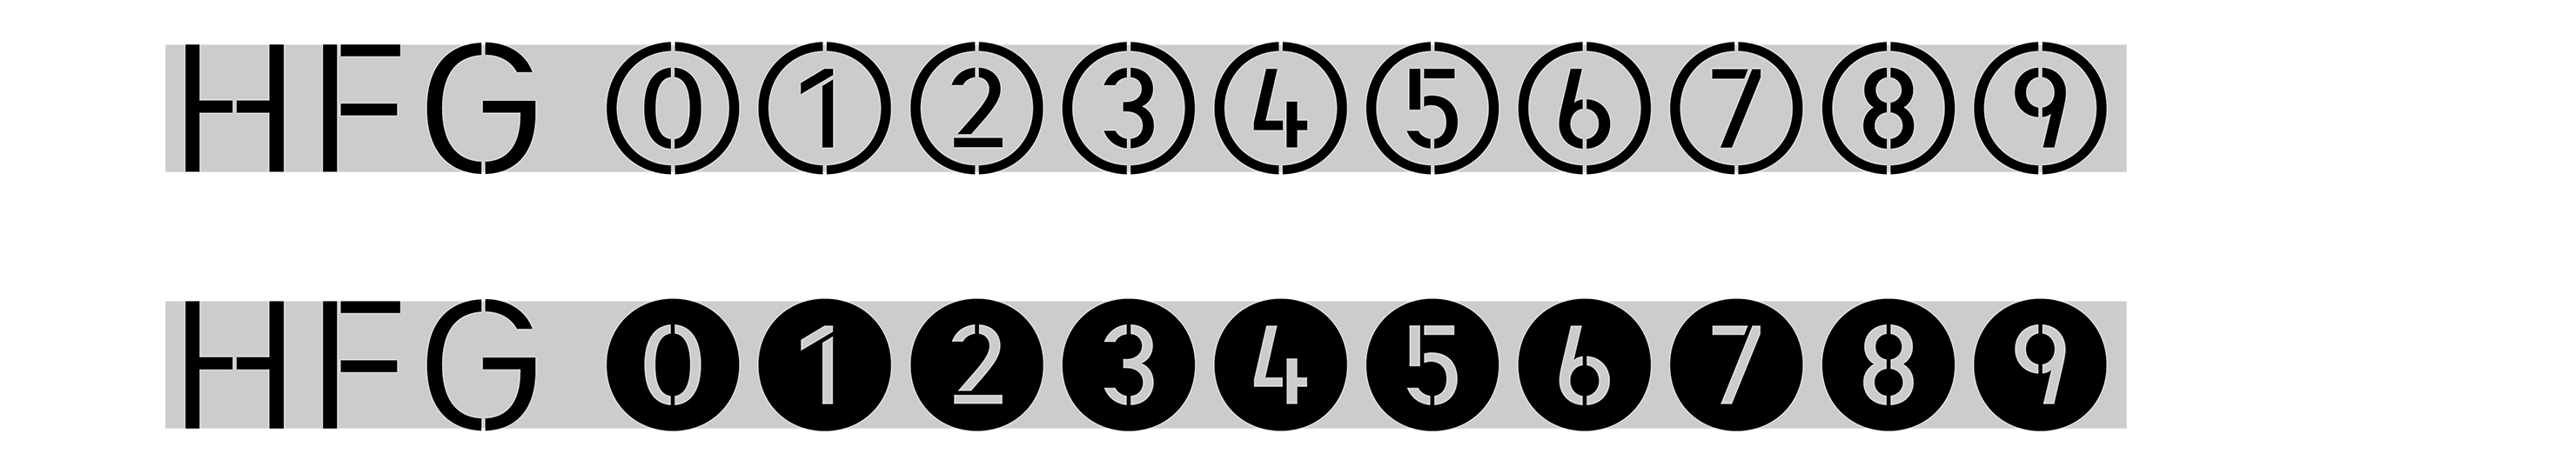 Typeface-Heimat-Stencil-F16-Atlas-Font-Foundry